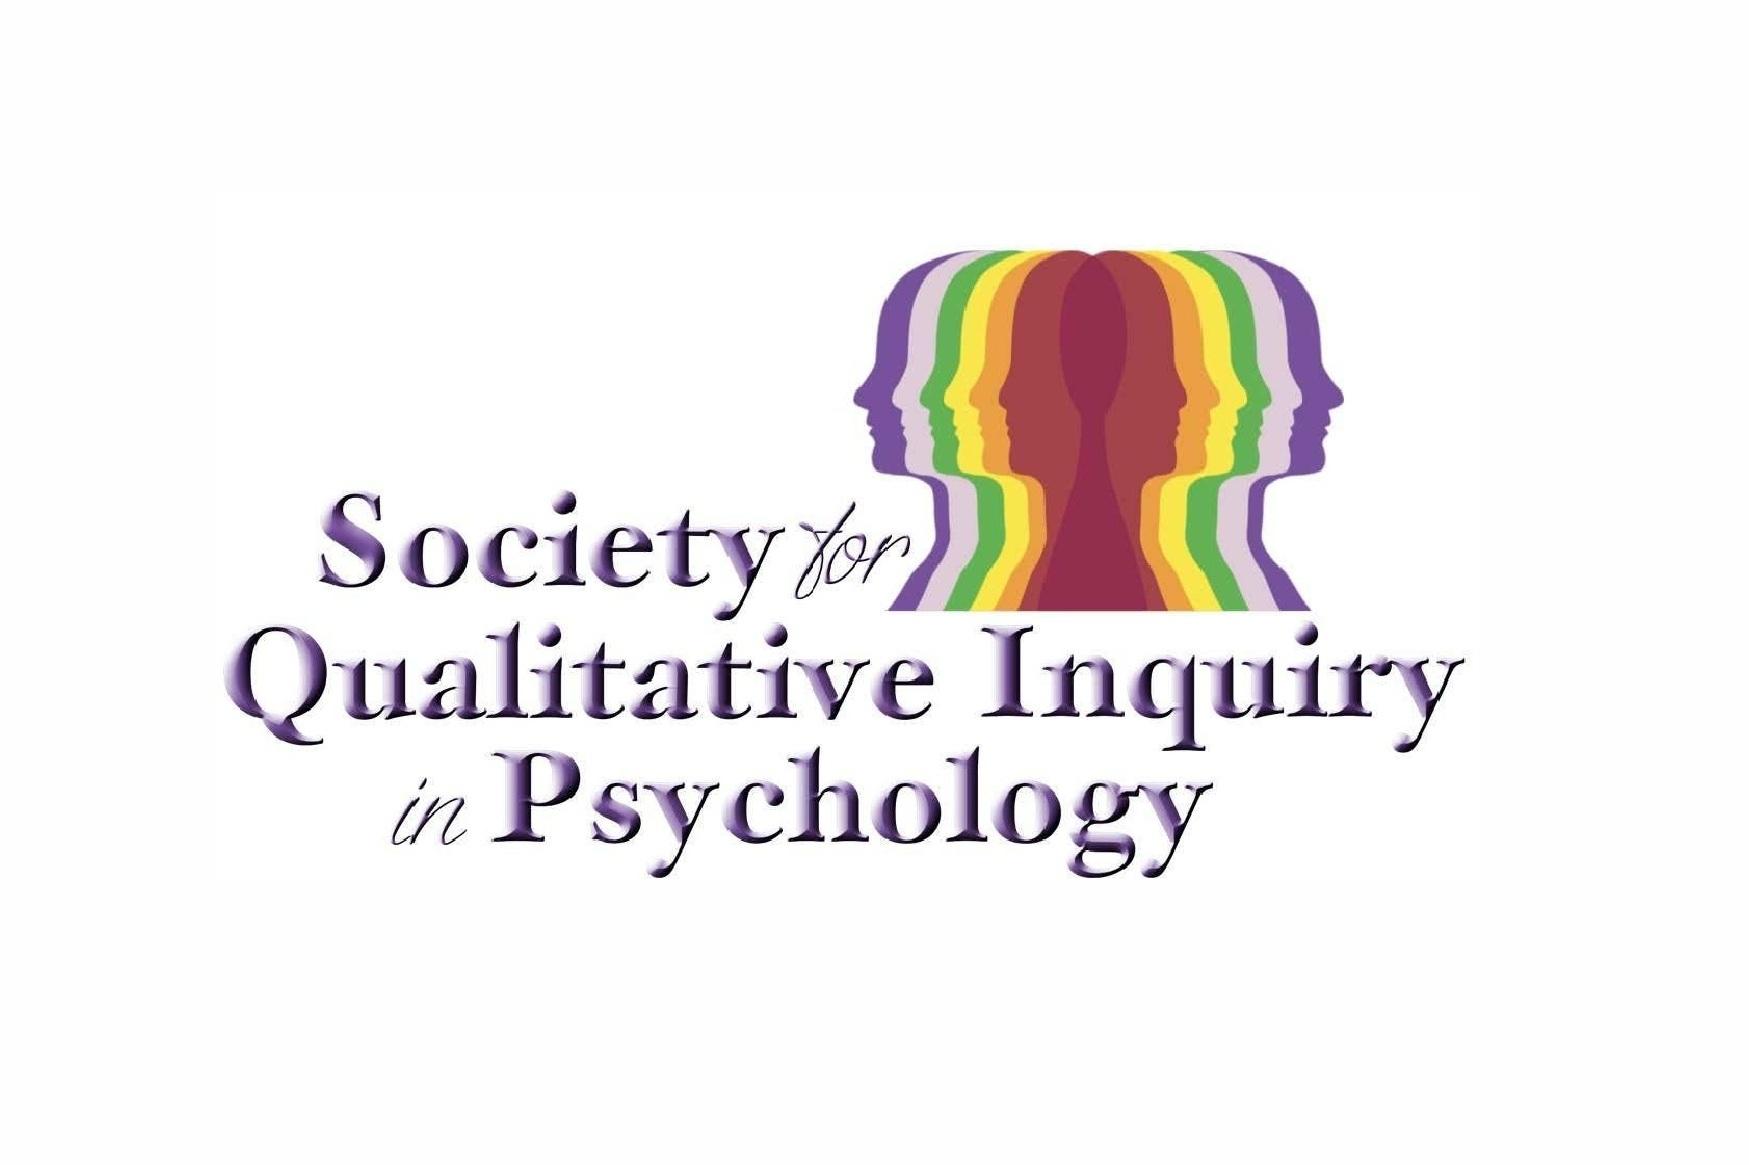 Society%2Bfor%2BQualitative%2BInquiry%2Bin%2BPsychology%2BLogo.jpg